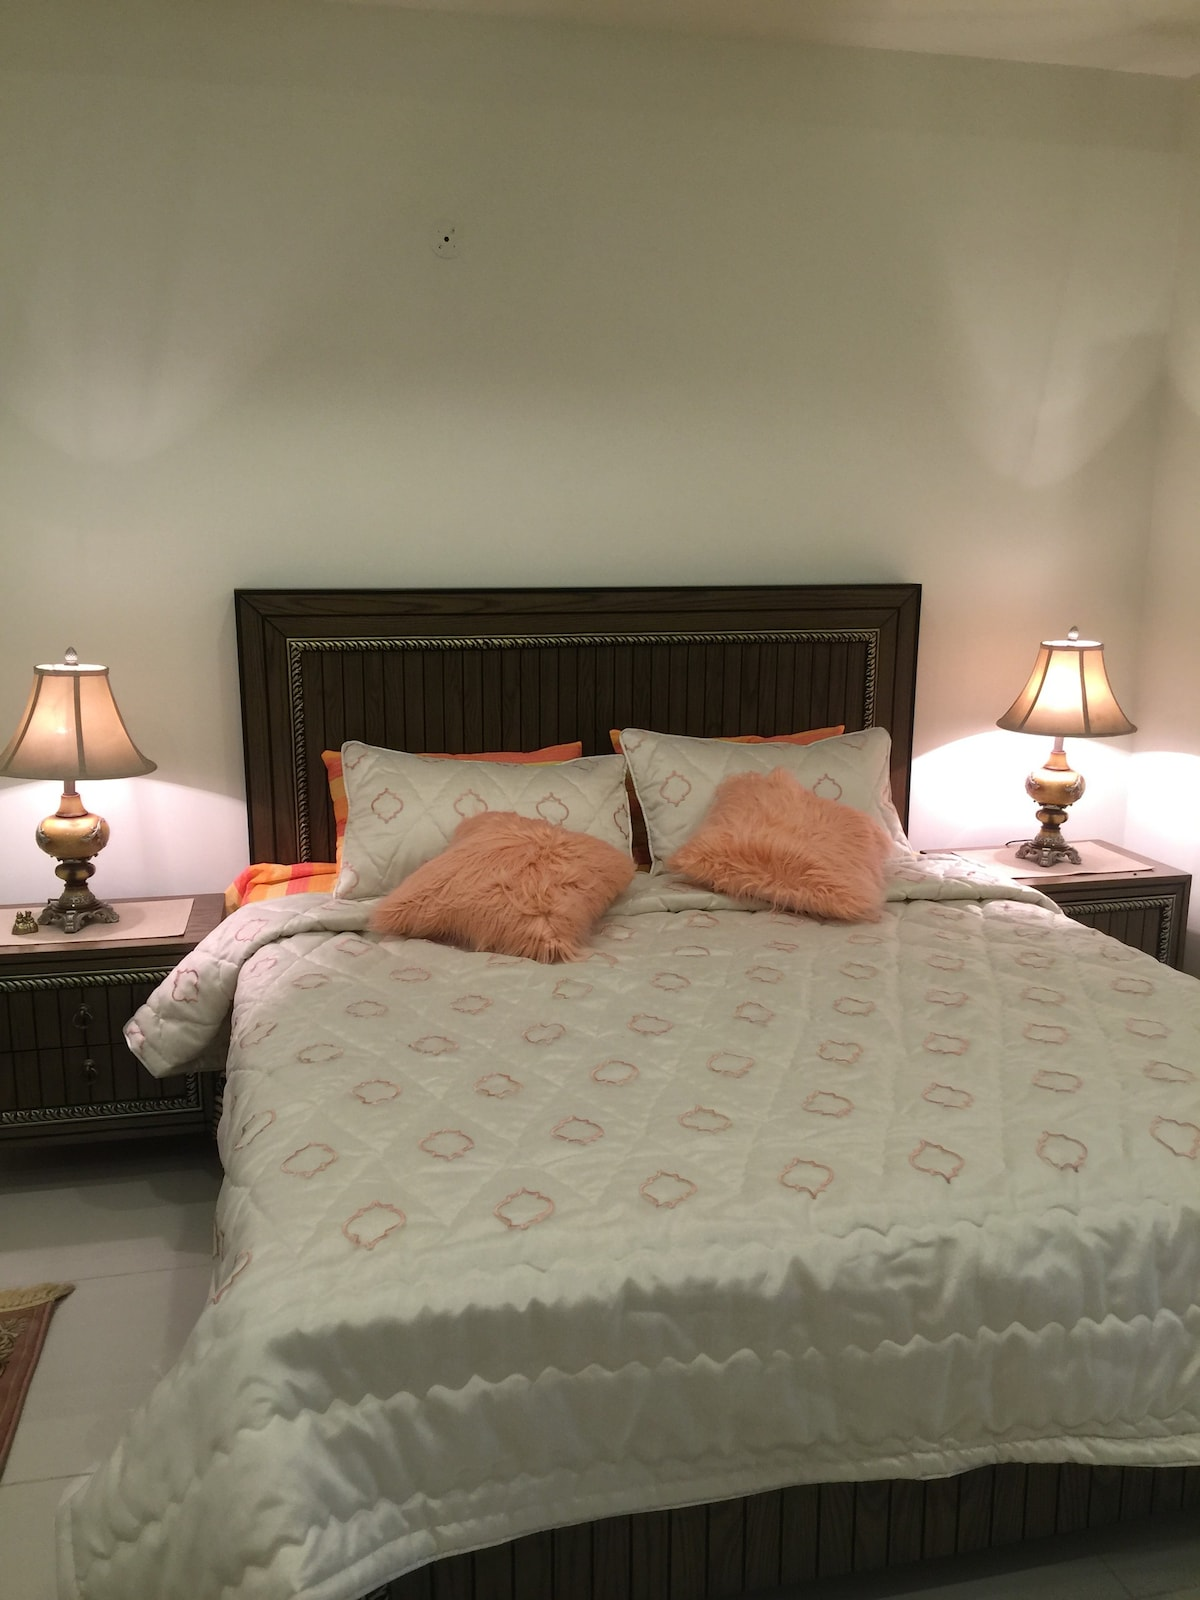 1 BEDROOM AT GRAND LUXURY APARTMENTS SHAH JAMAL